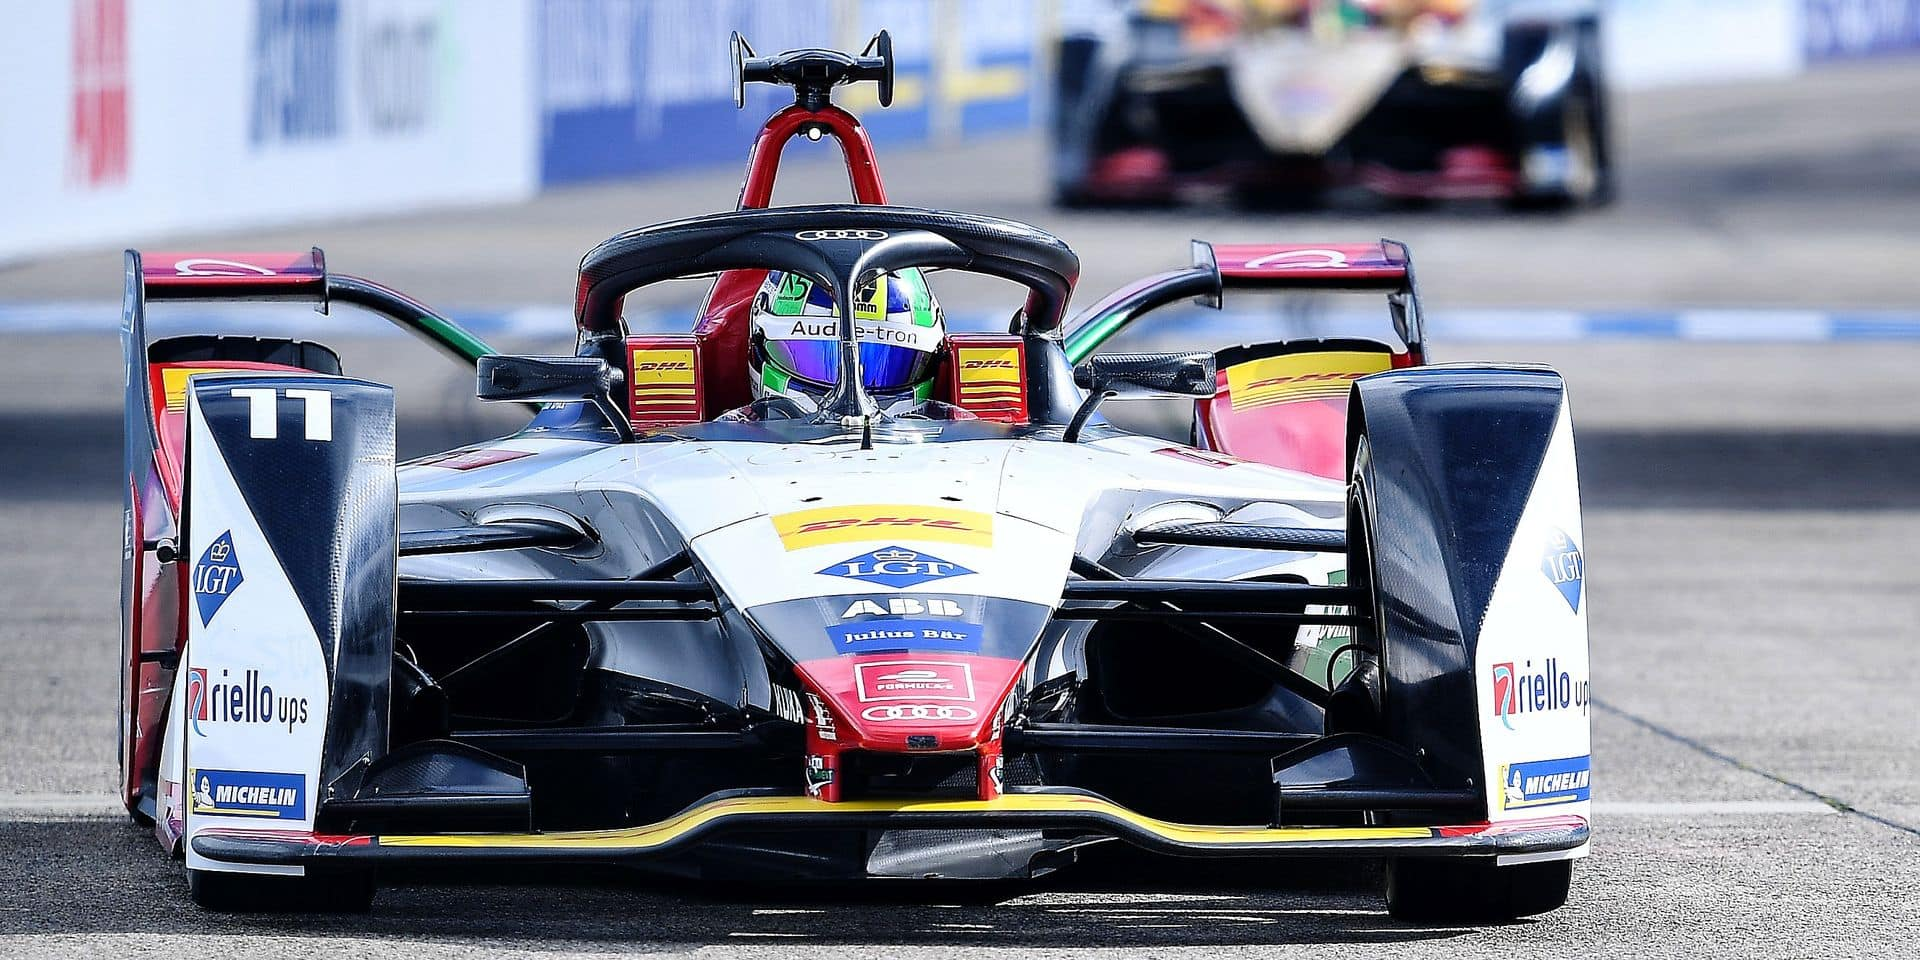 Motorsport, Formula E: Berlin E-Prix 2019